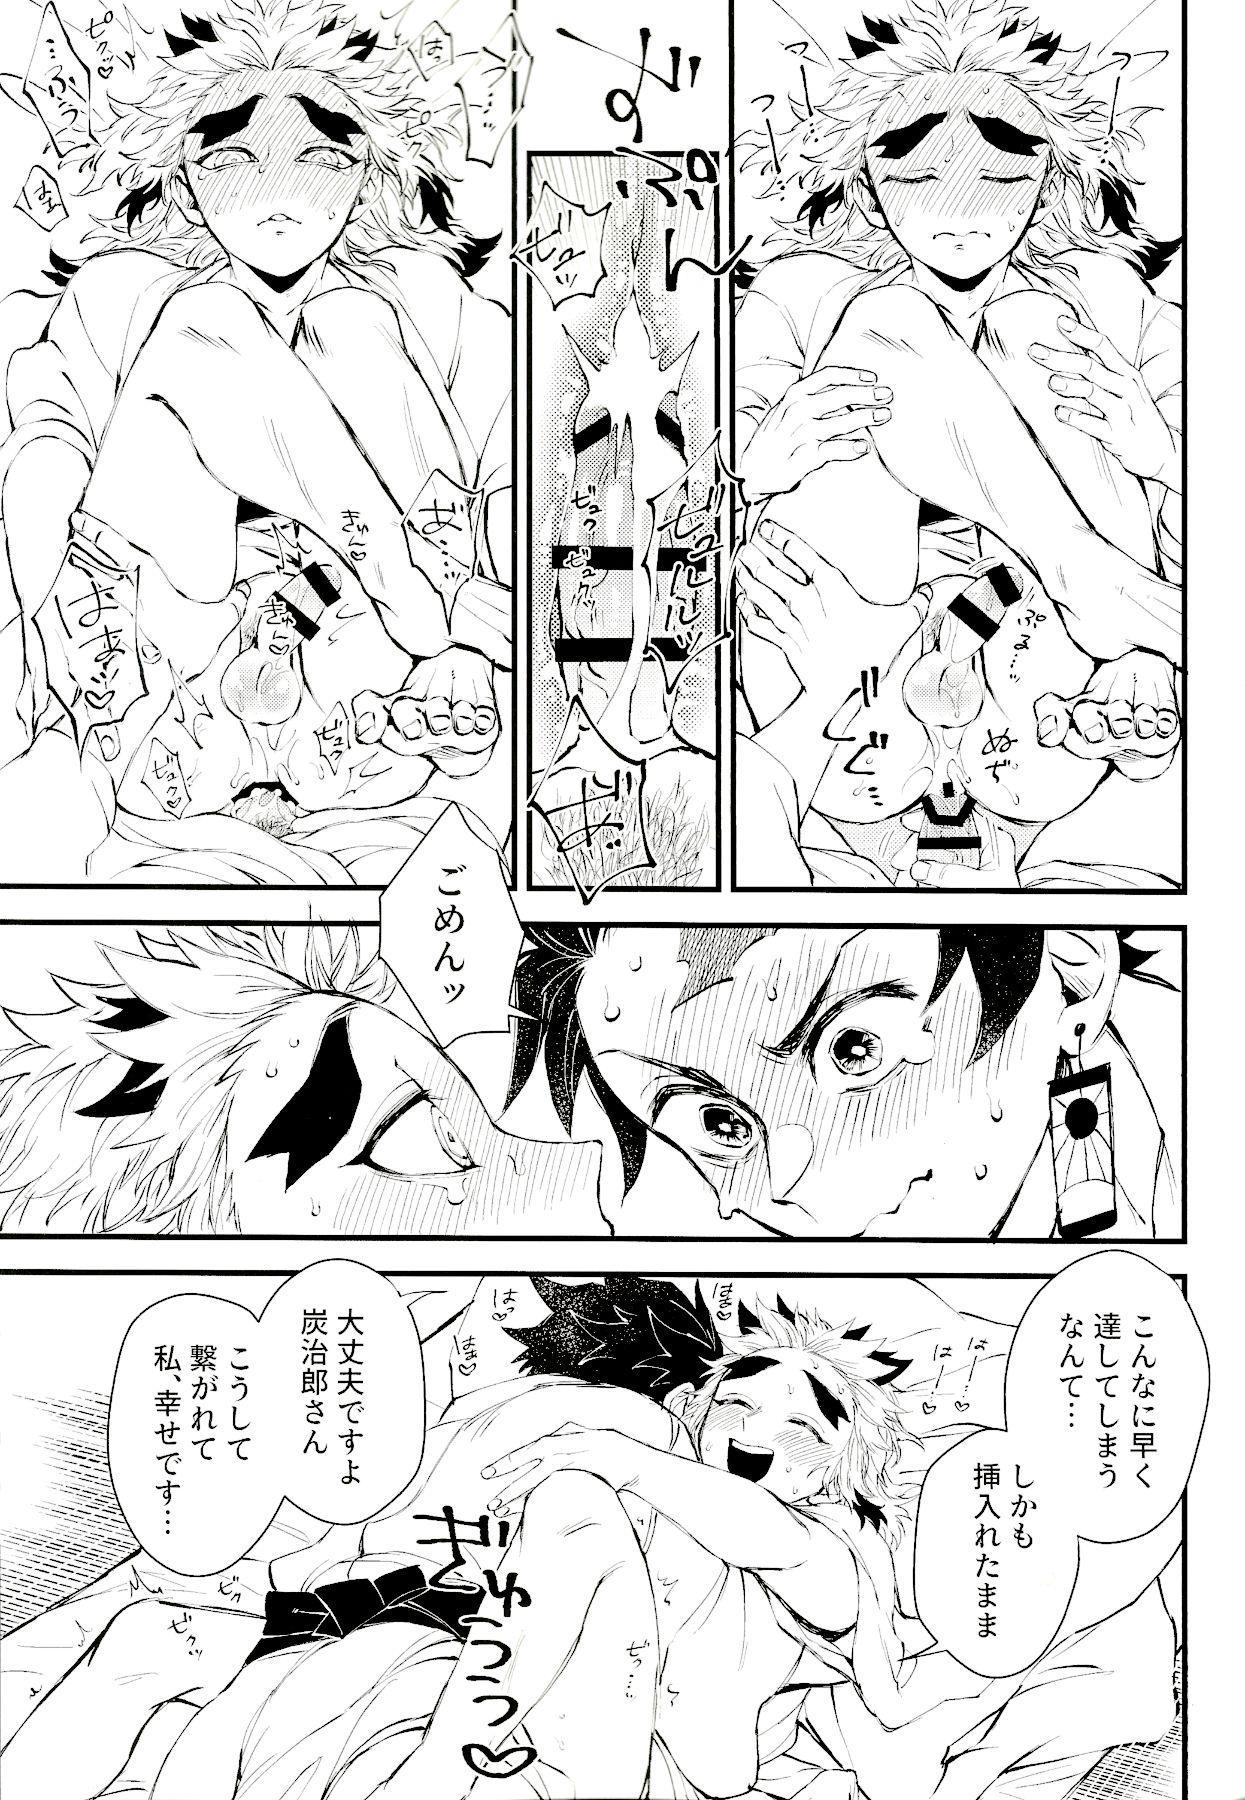 Soujuku na Koi Gokoro 17